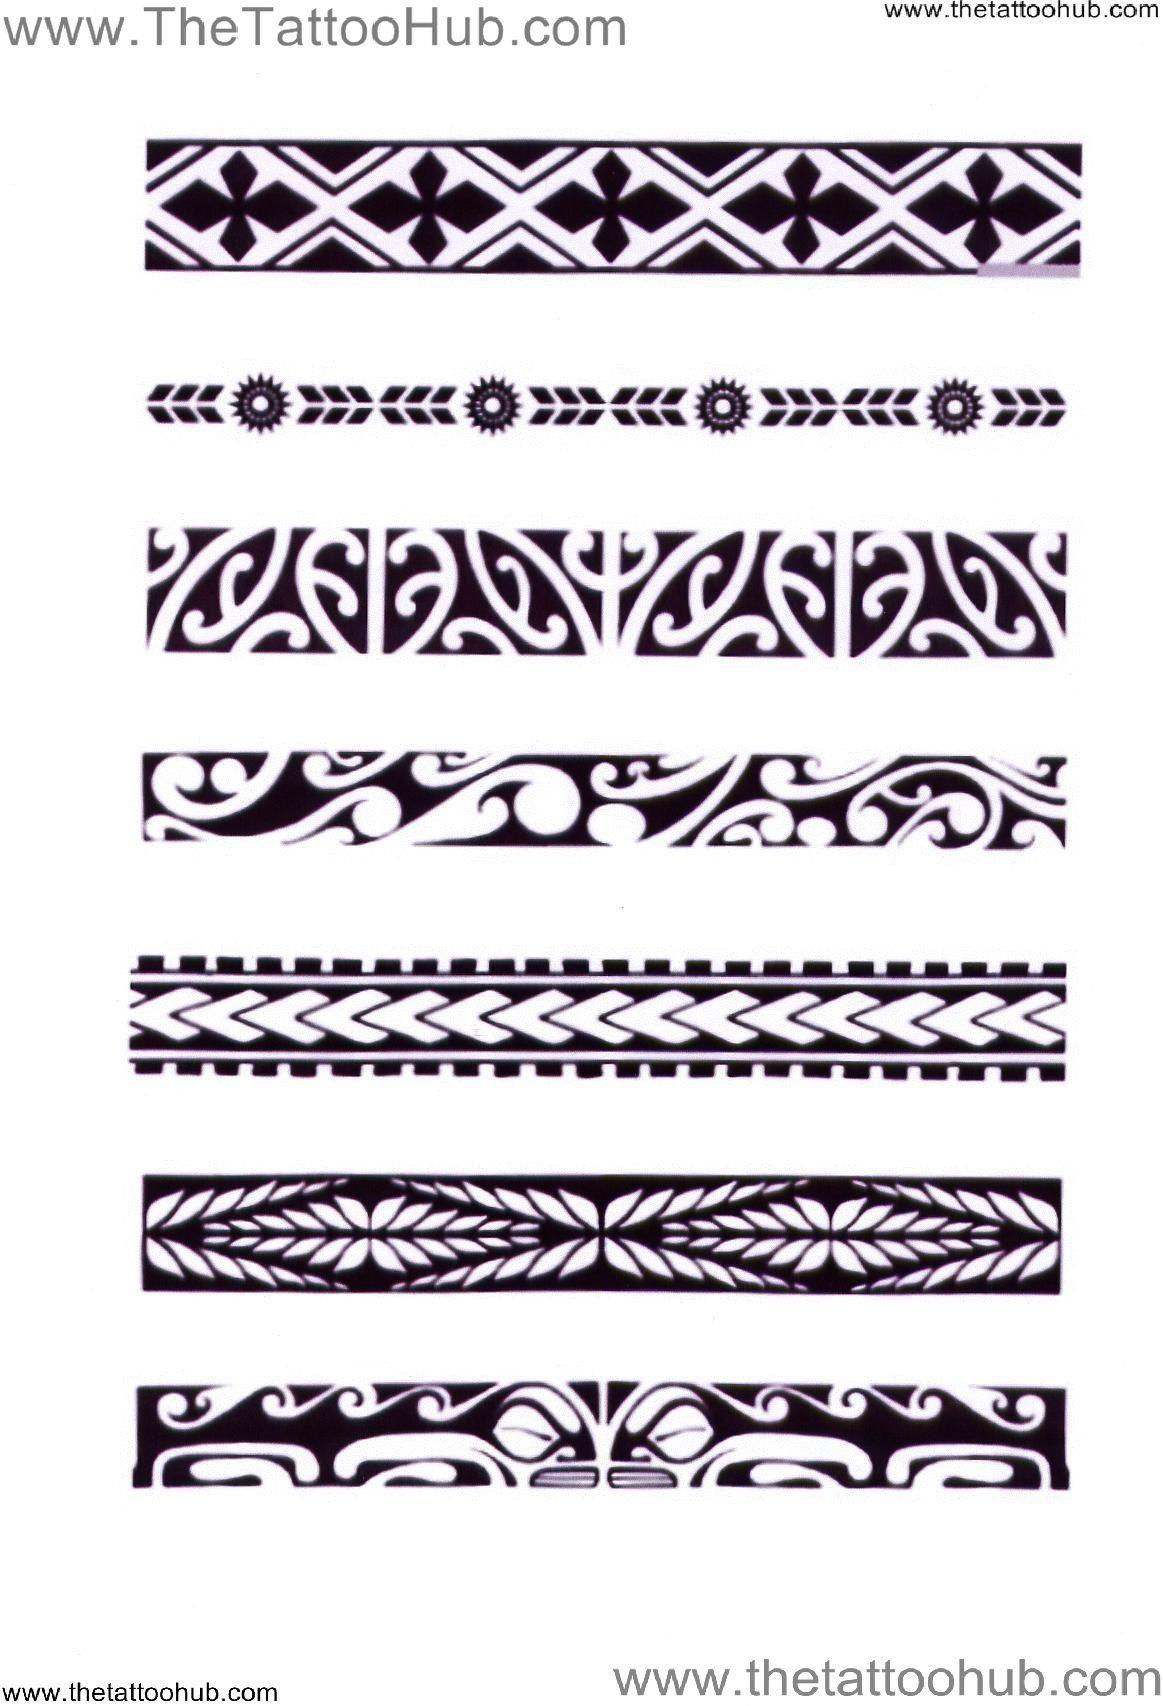 Tribal Hawaiian band tattoos meanings video